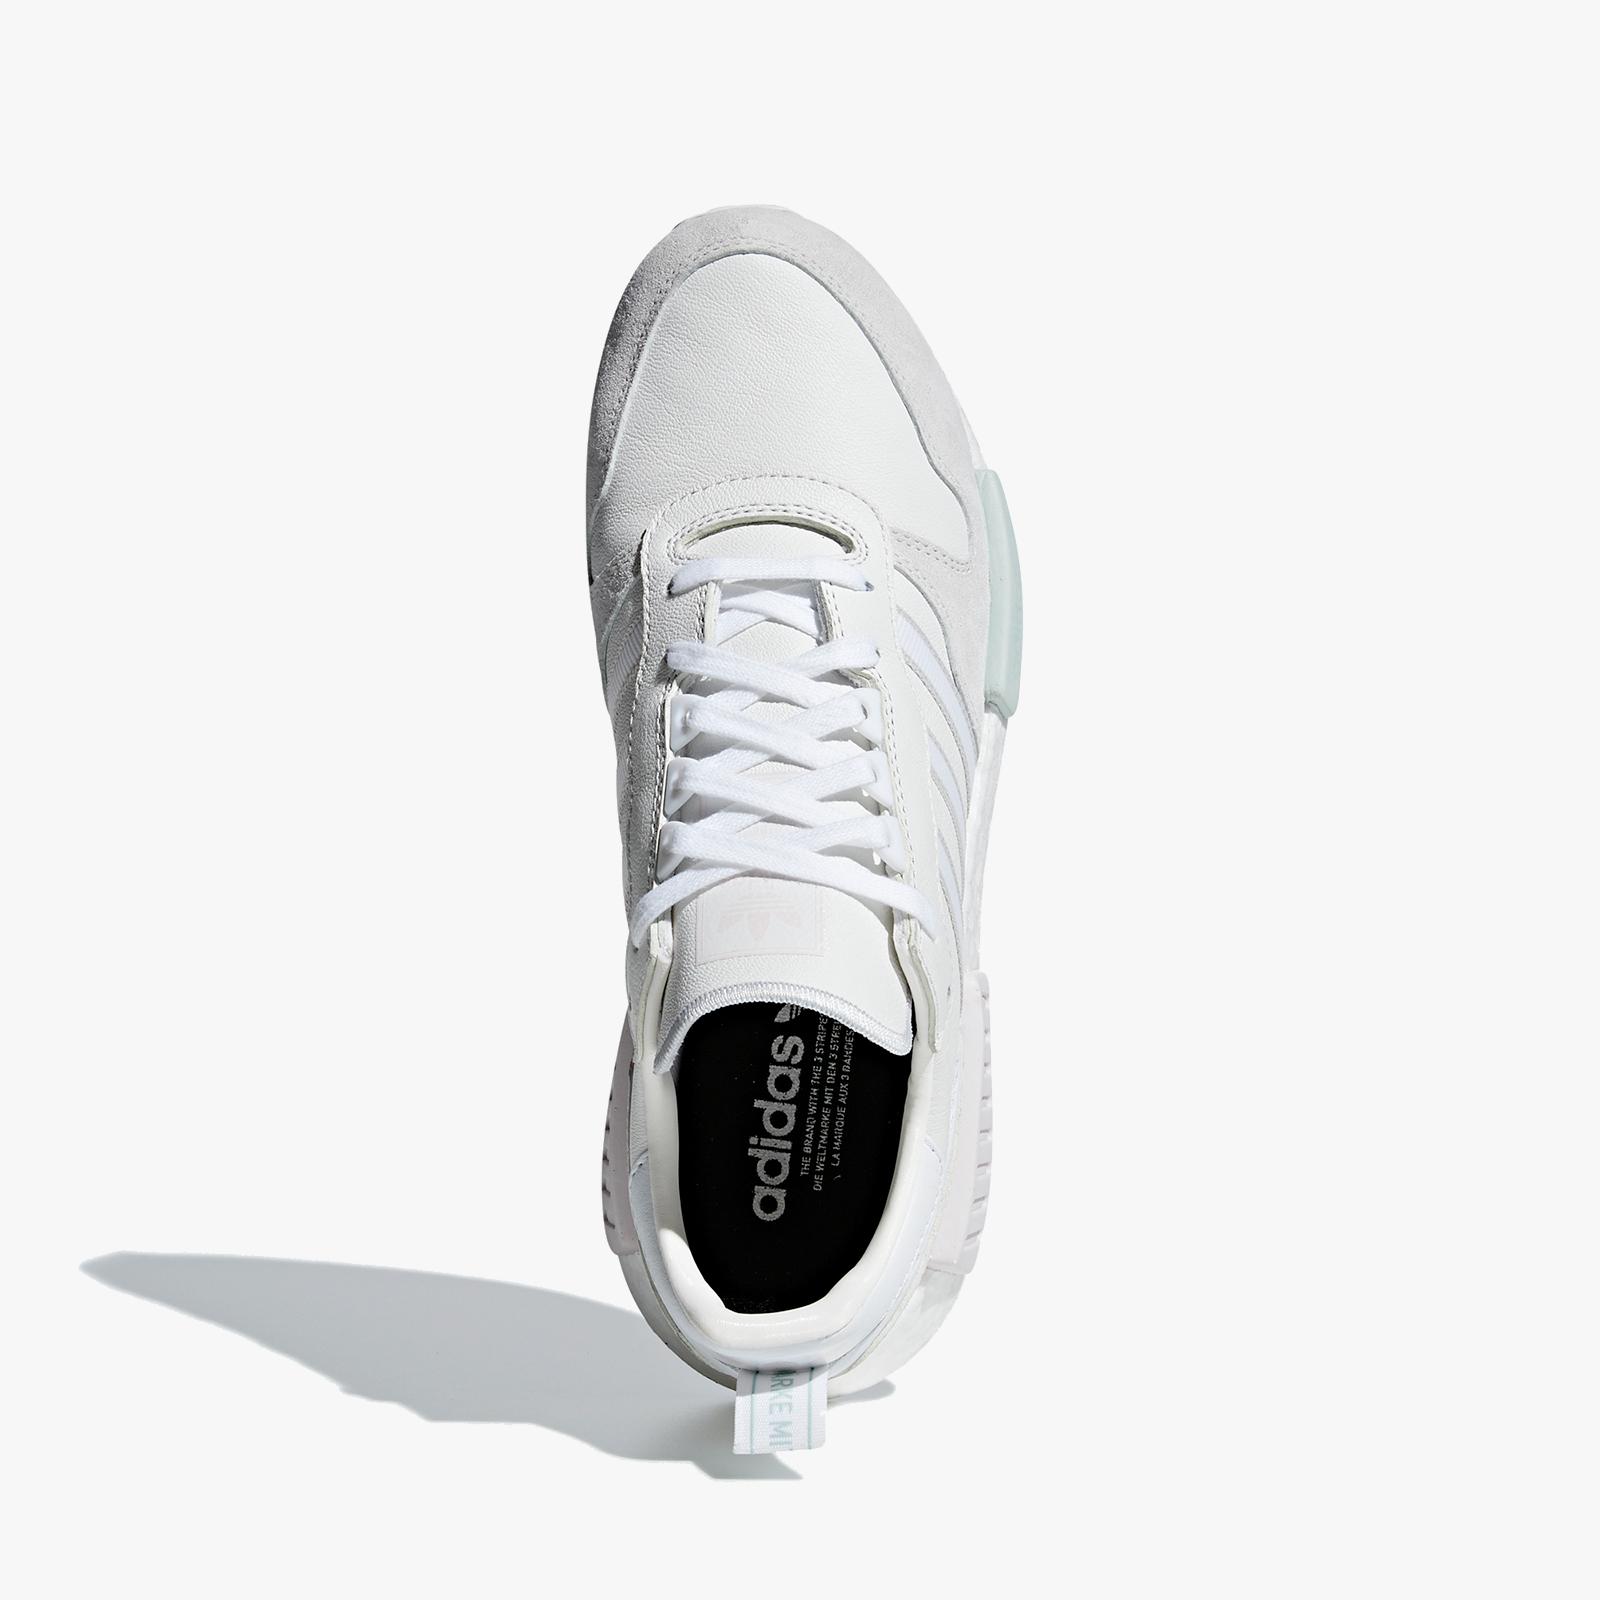 b3cd3d4b6 adidas Rising Star x R1 - G28939 - Sneakersnstuff